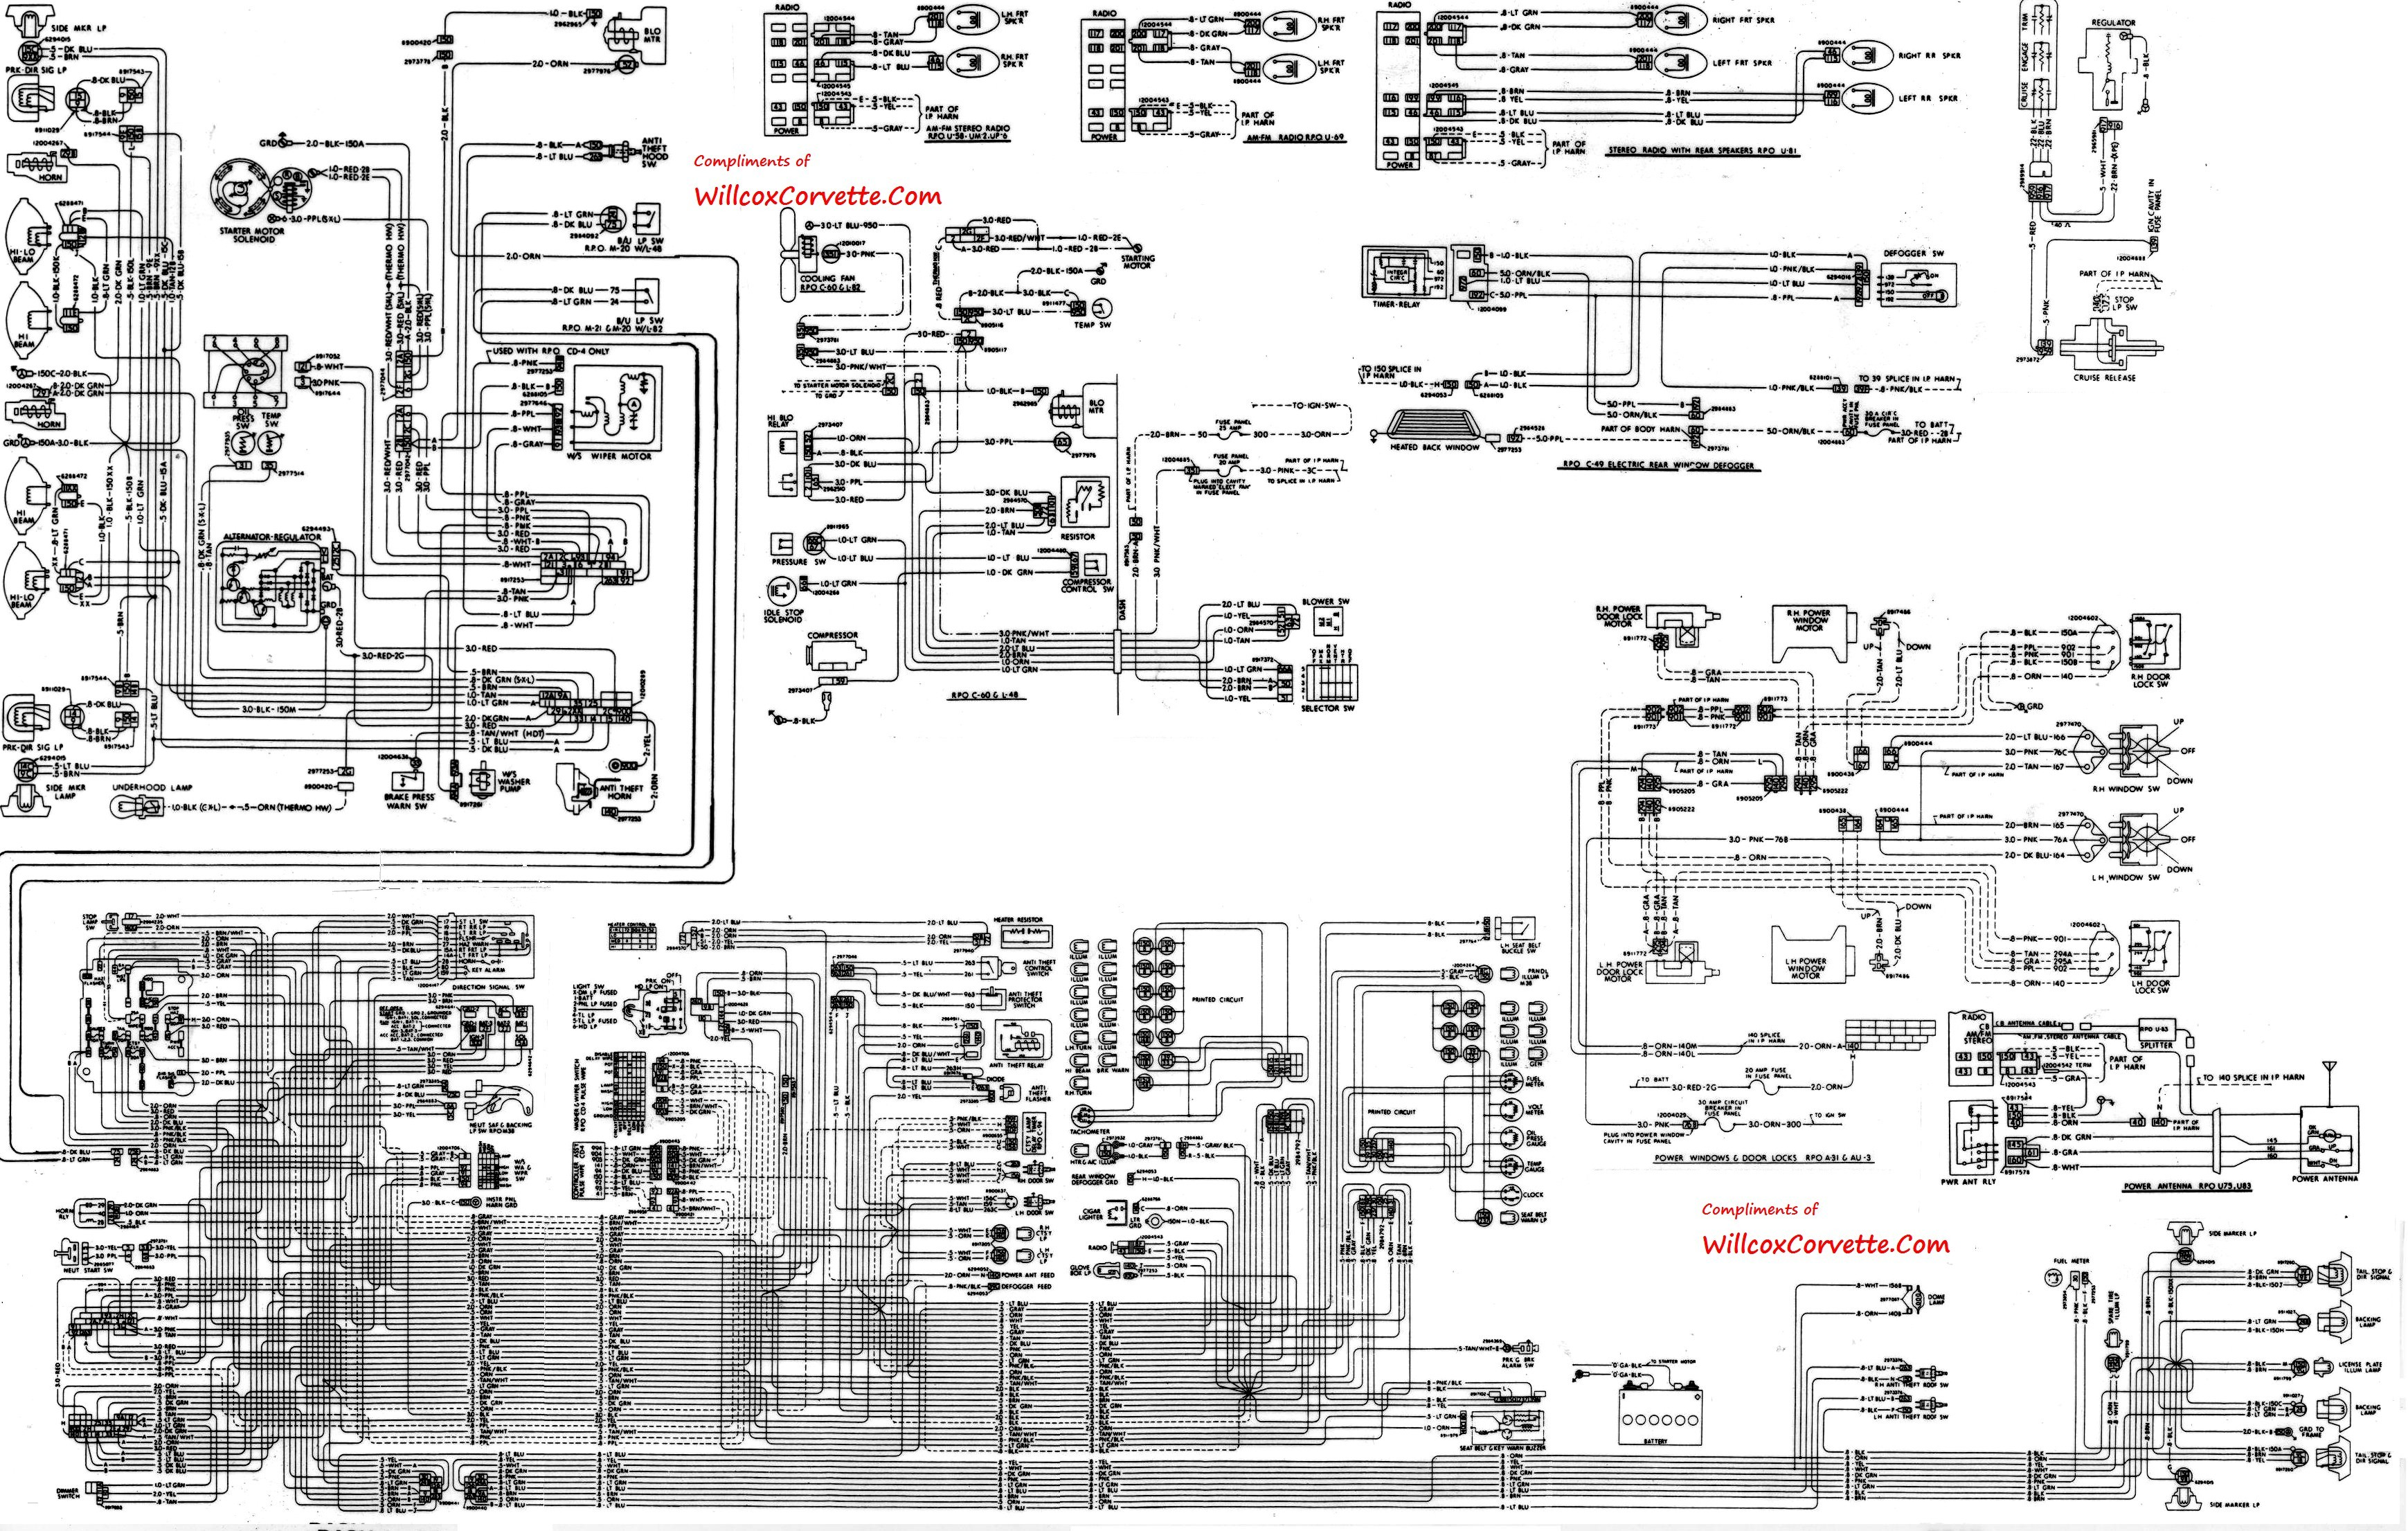 Circuit Diagram Symbols Download Harley Davidson Wiring Diagrams and Schematics Fxr Wiring Diagram